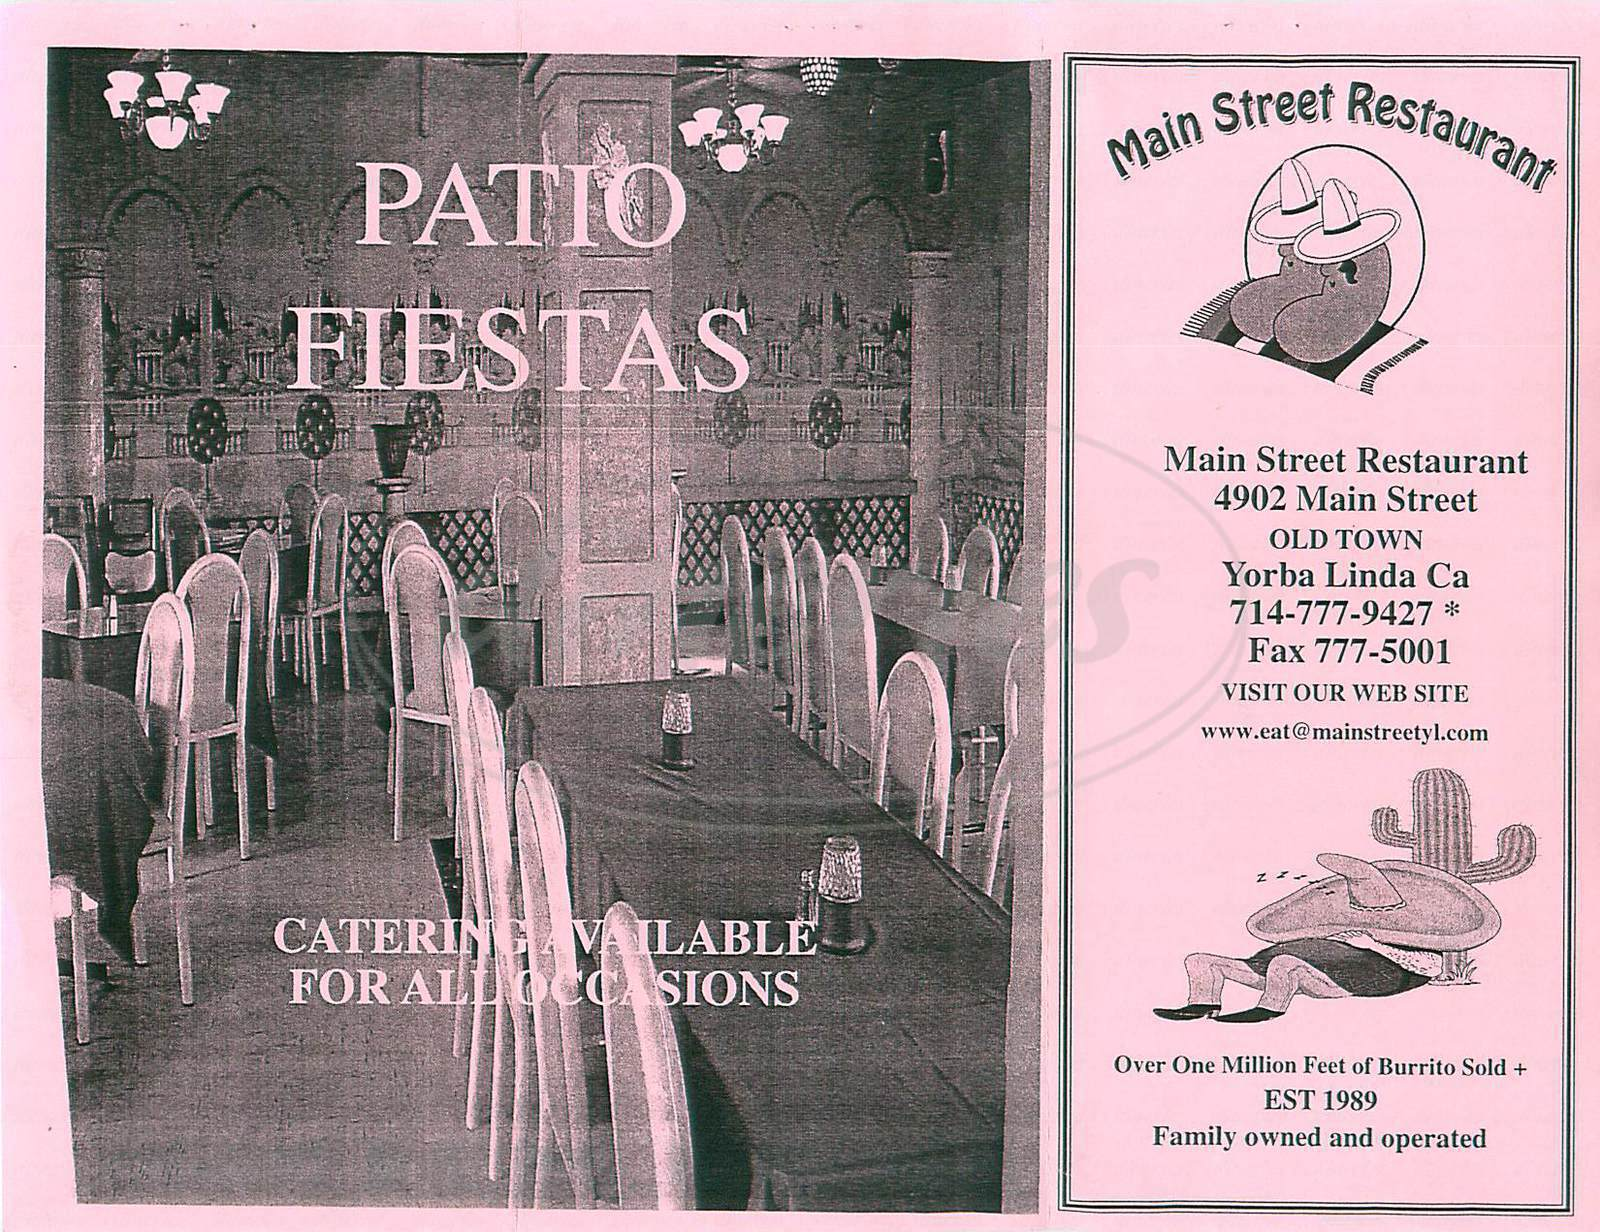 menu for Main Street Restaurant